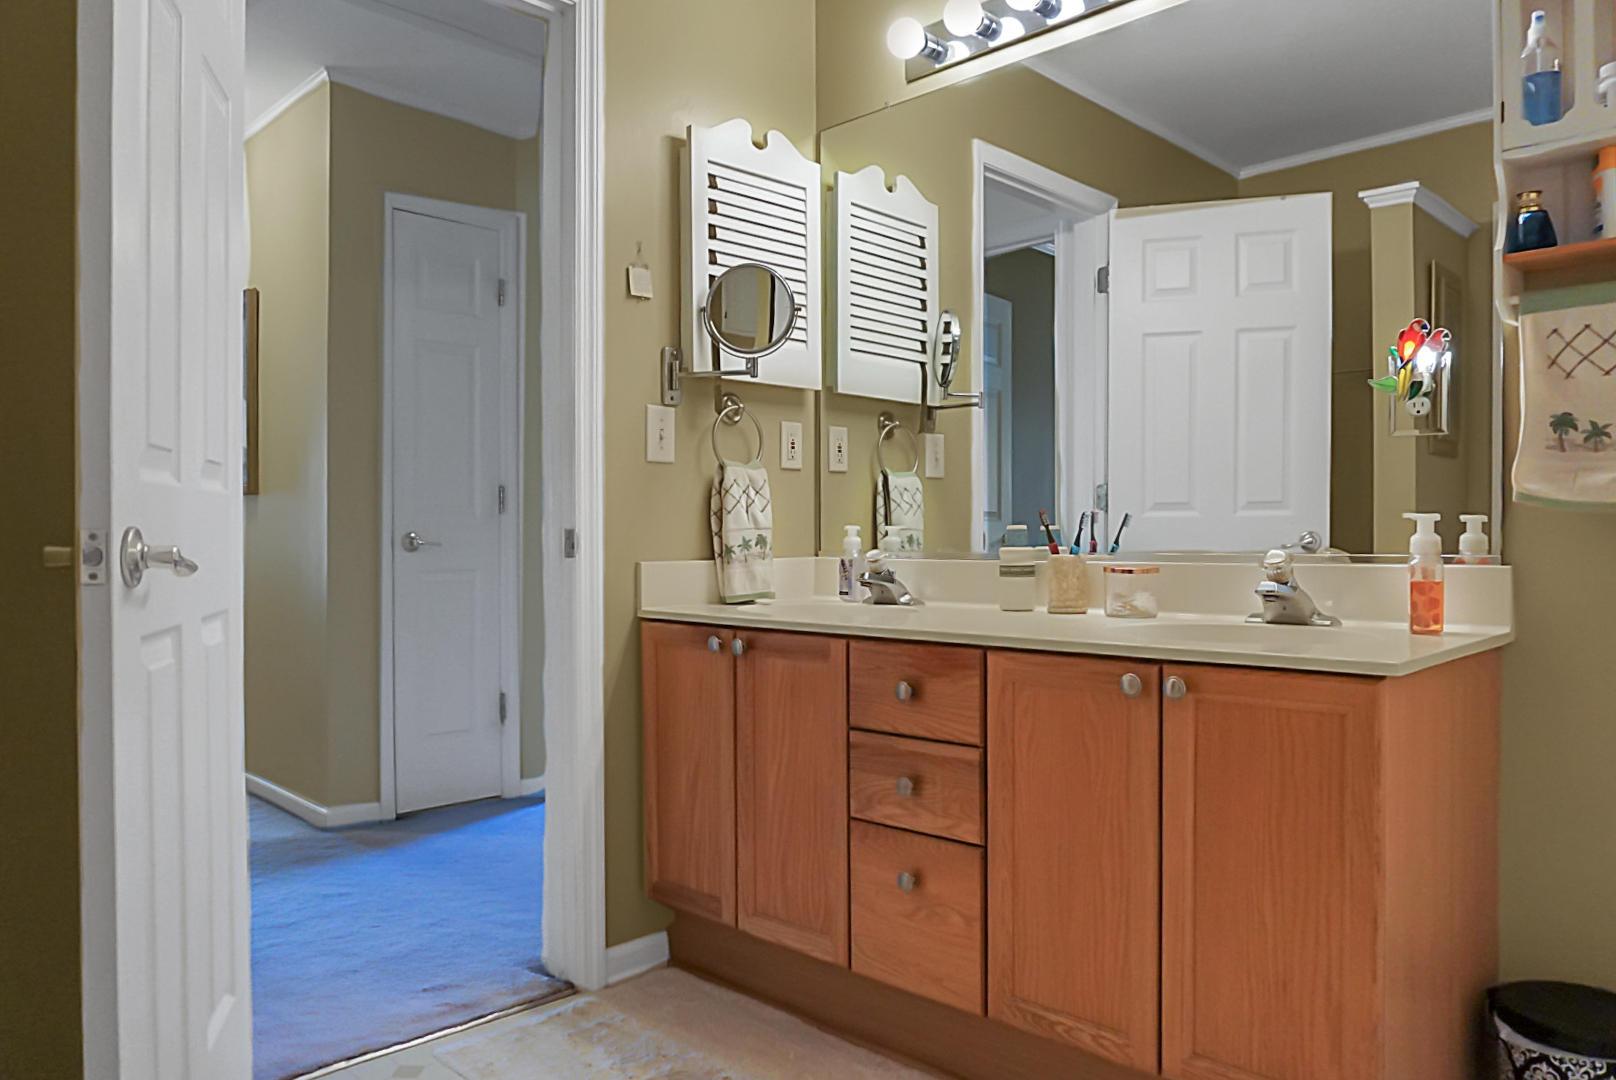 Ivy Hall Homes For Sale - 3075 Morningdale, Mount Pleasant, SC - 15